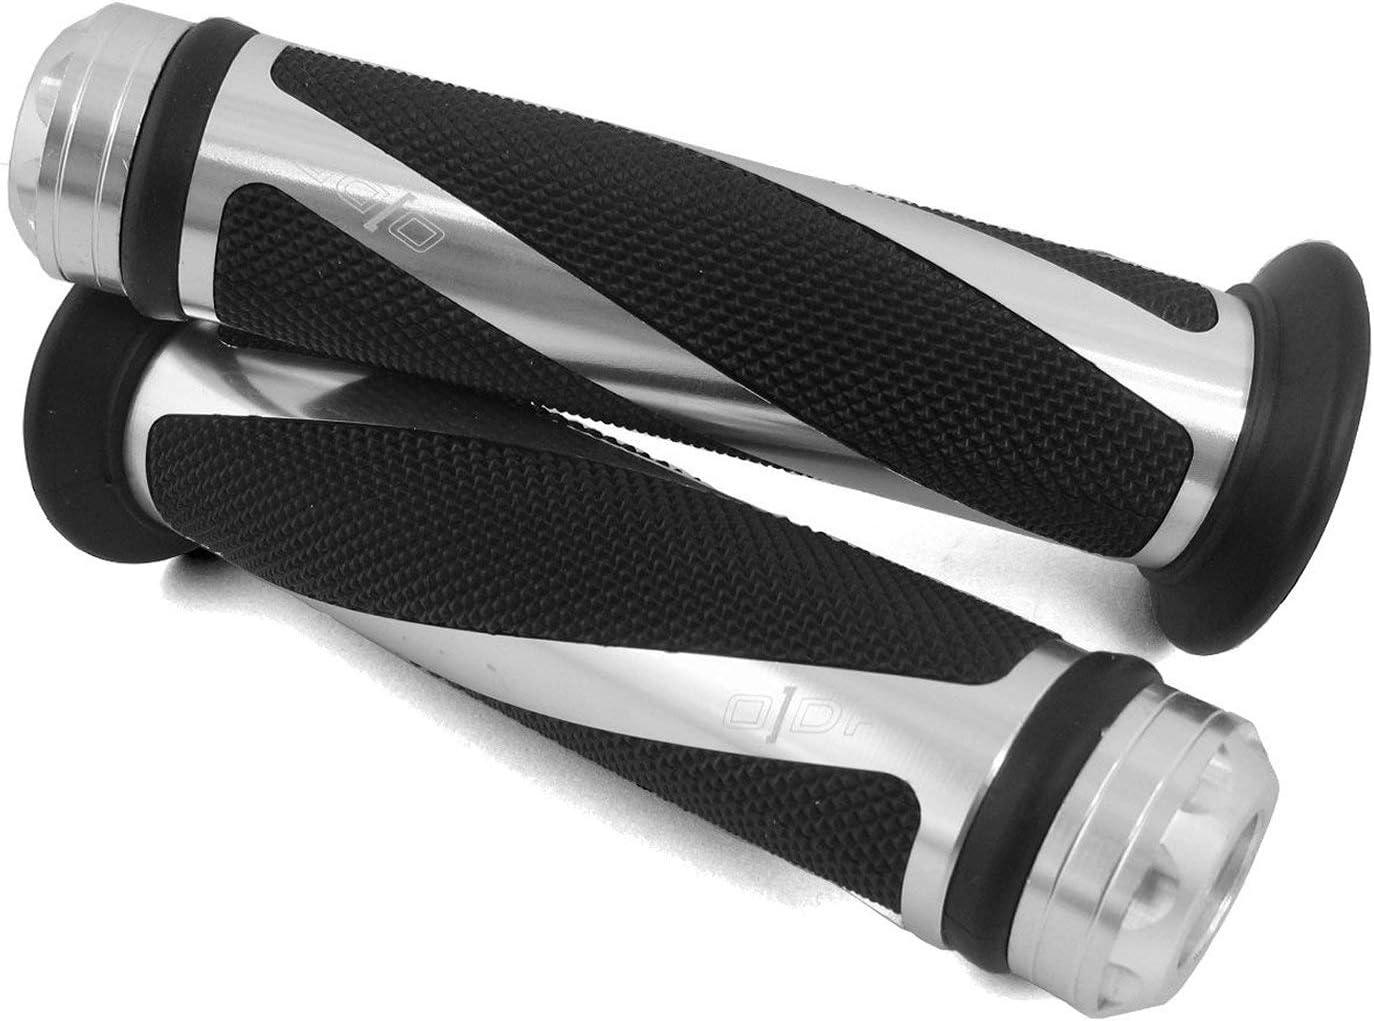 Diversion XJ 600 XJ 6 XJ6 N 600 Coil//Silber Lenkergriffe kompatibel mit Yamaha XJ 650